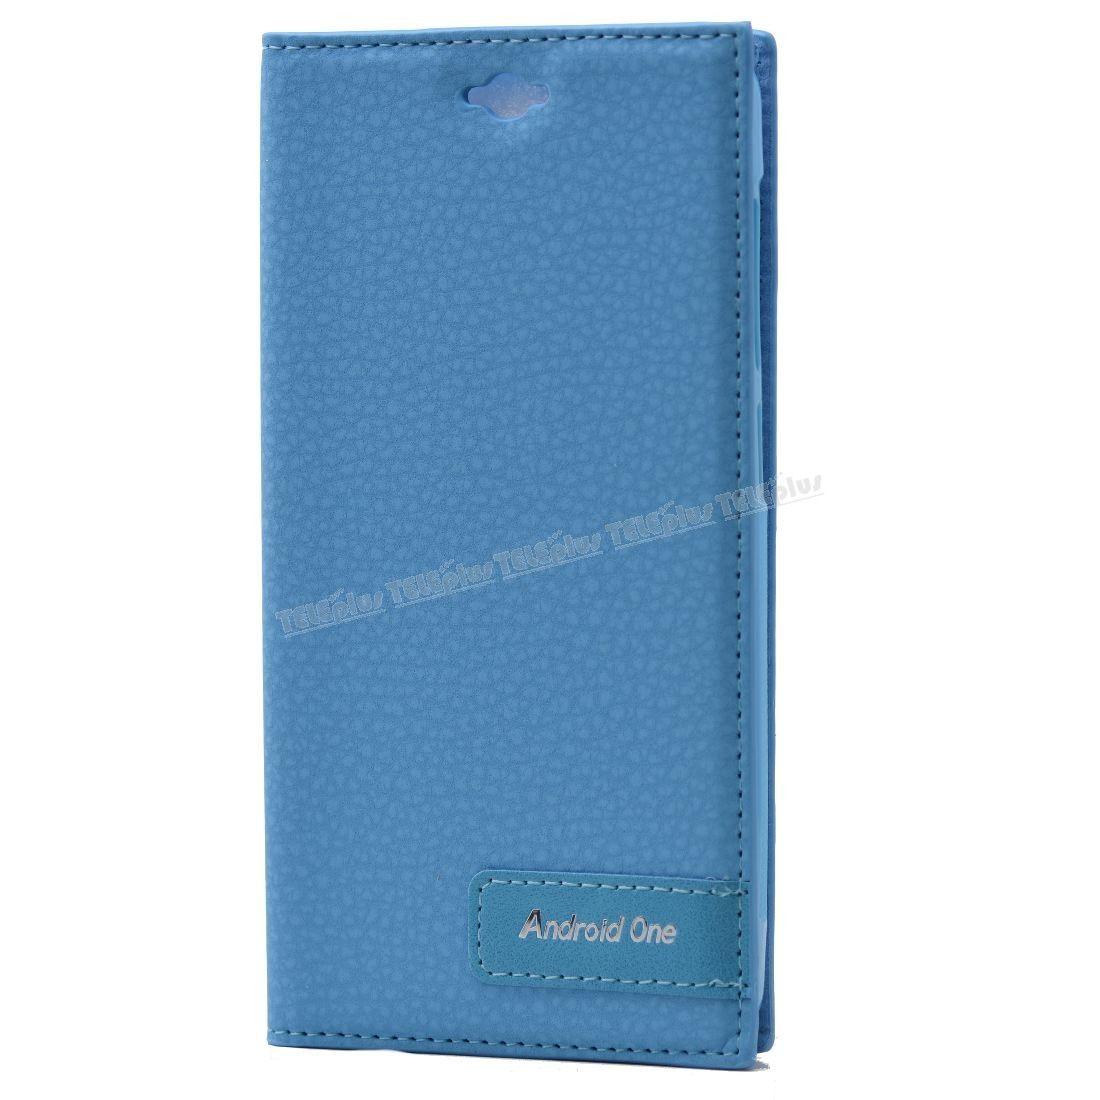 Android One 4G Flip Cover Kılıf Mavi -  - Price : TL29.90. Buy now at http://www.teleplus.com.tr/index.php/android-one-4g-flip-cover-kilif-mavi.html